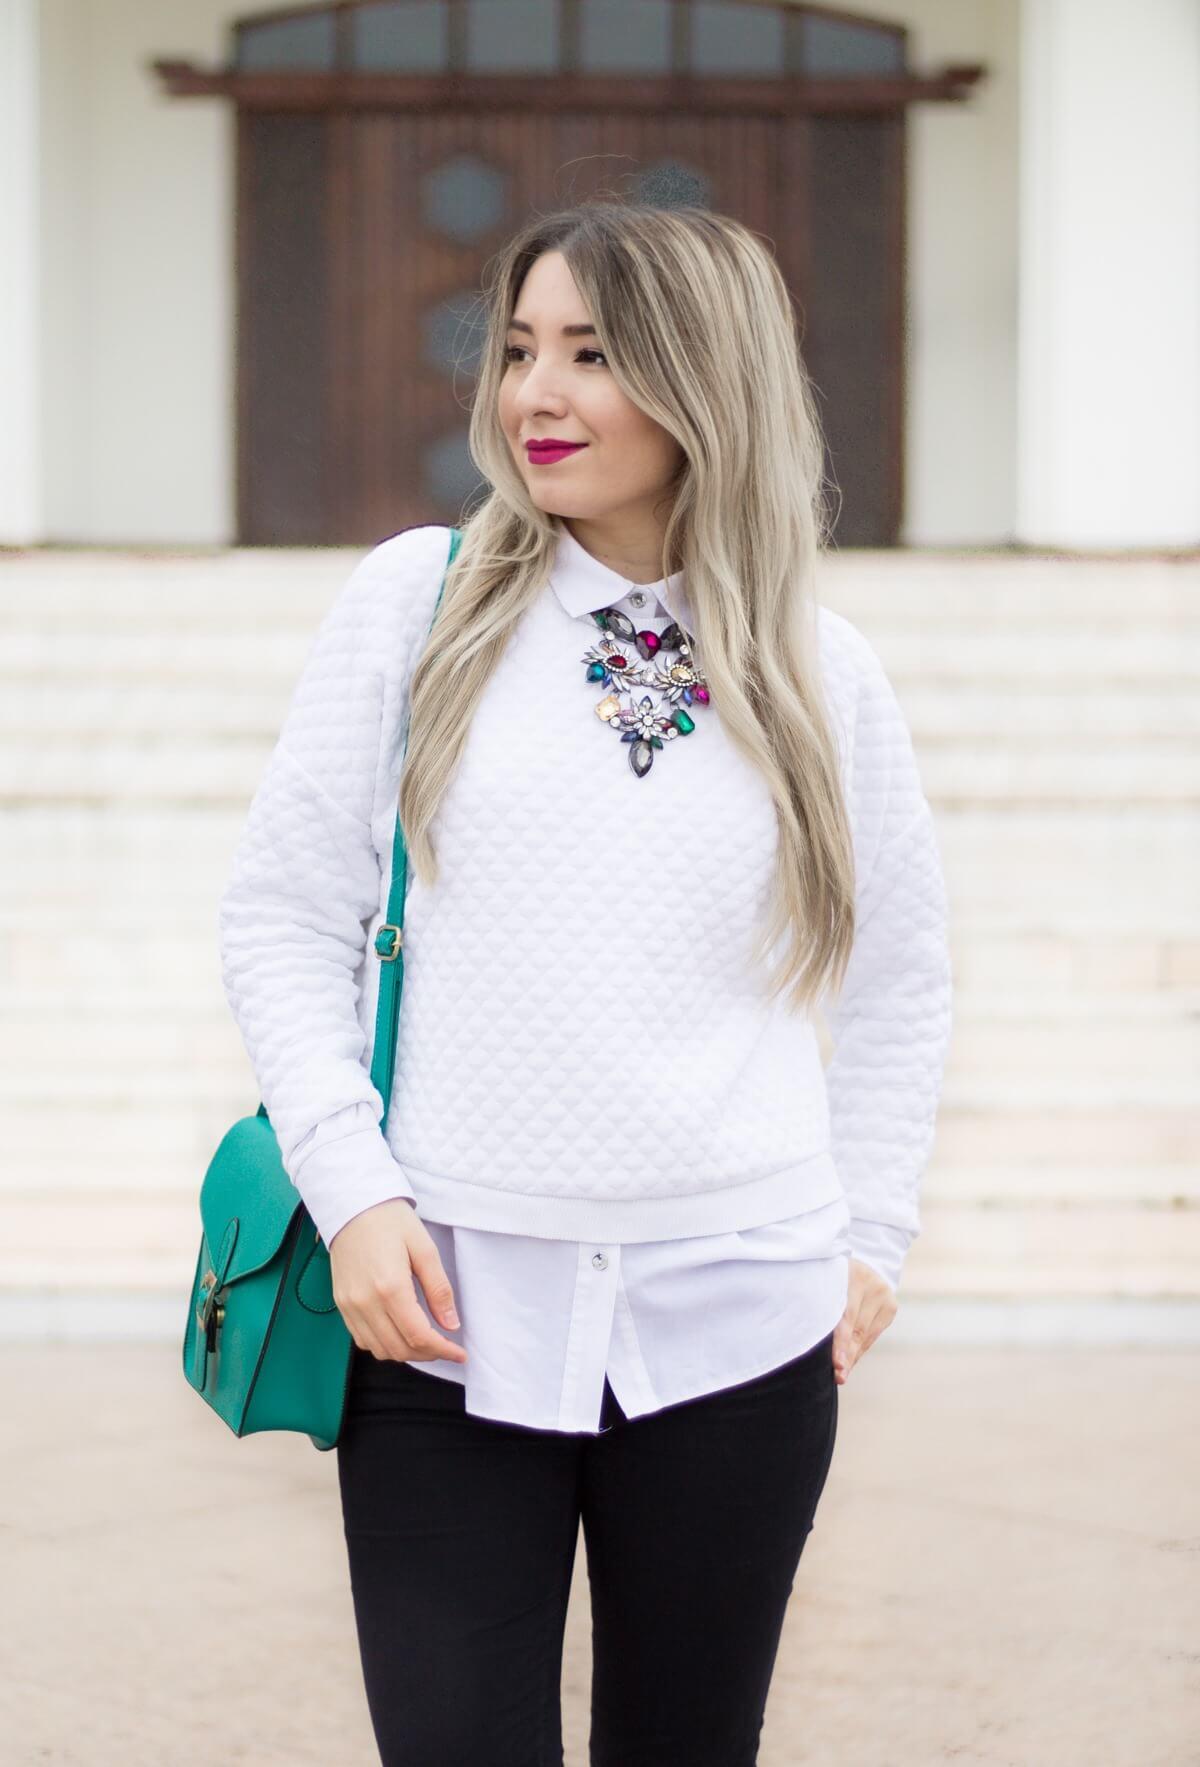 andreea ristea, colier statement pietre colorate, ruj fuchsia, roz, camasa luata cu bluza, pulover, alb peste alb, geanta verde, blogger moda, tinuta toamna